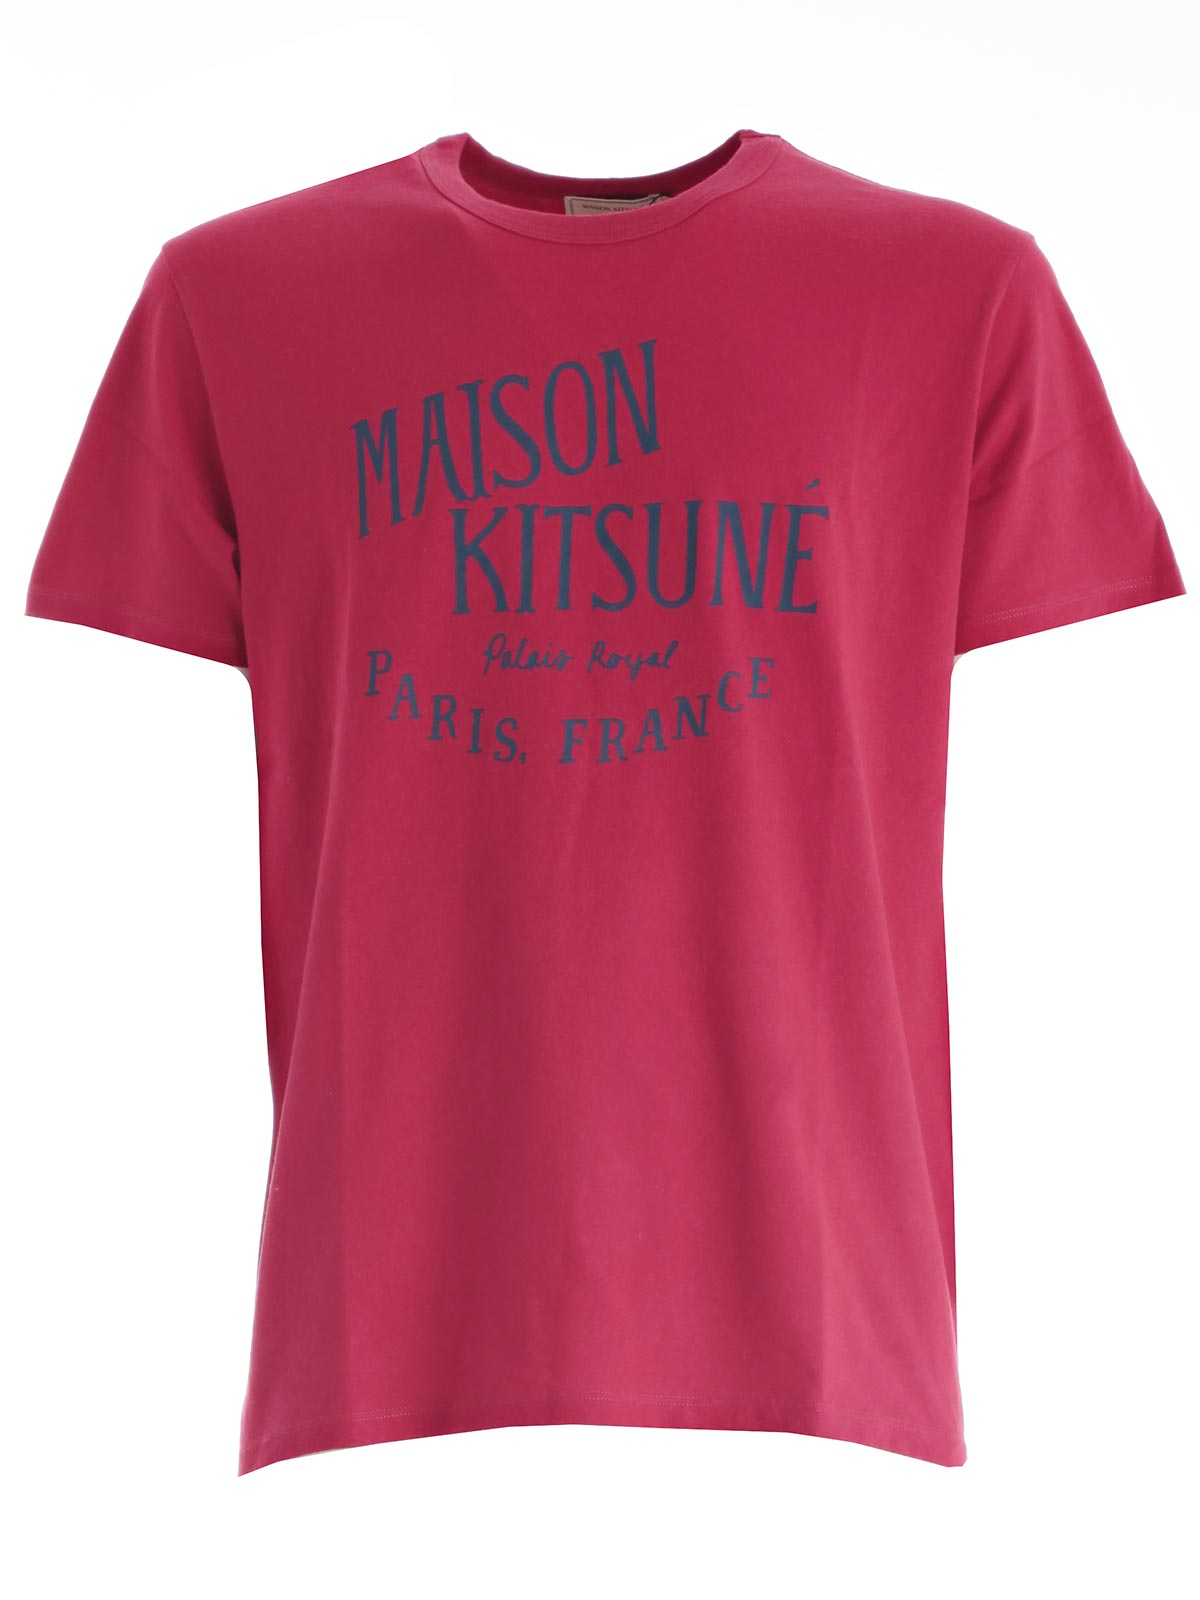 Picture of MAISON KITSUNE JERSEY